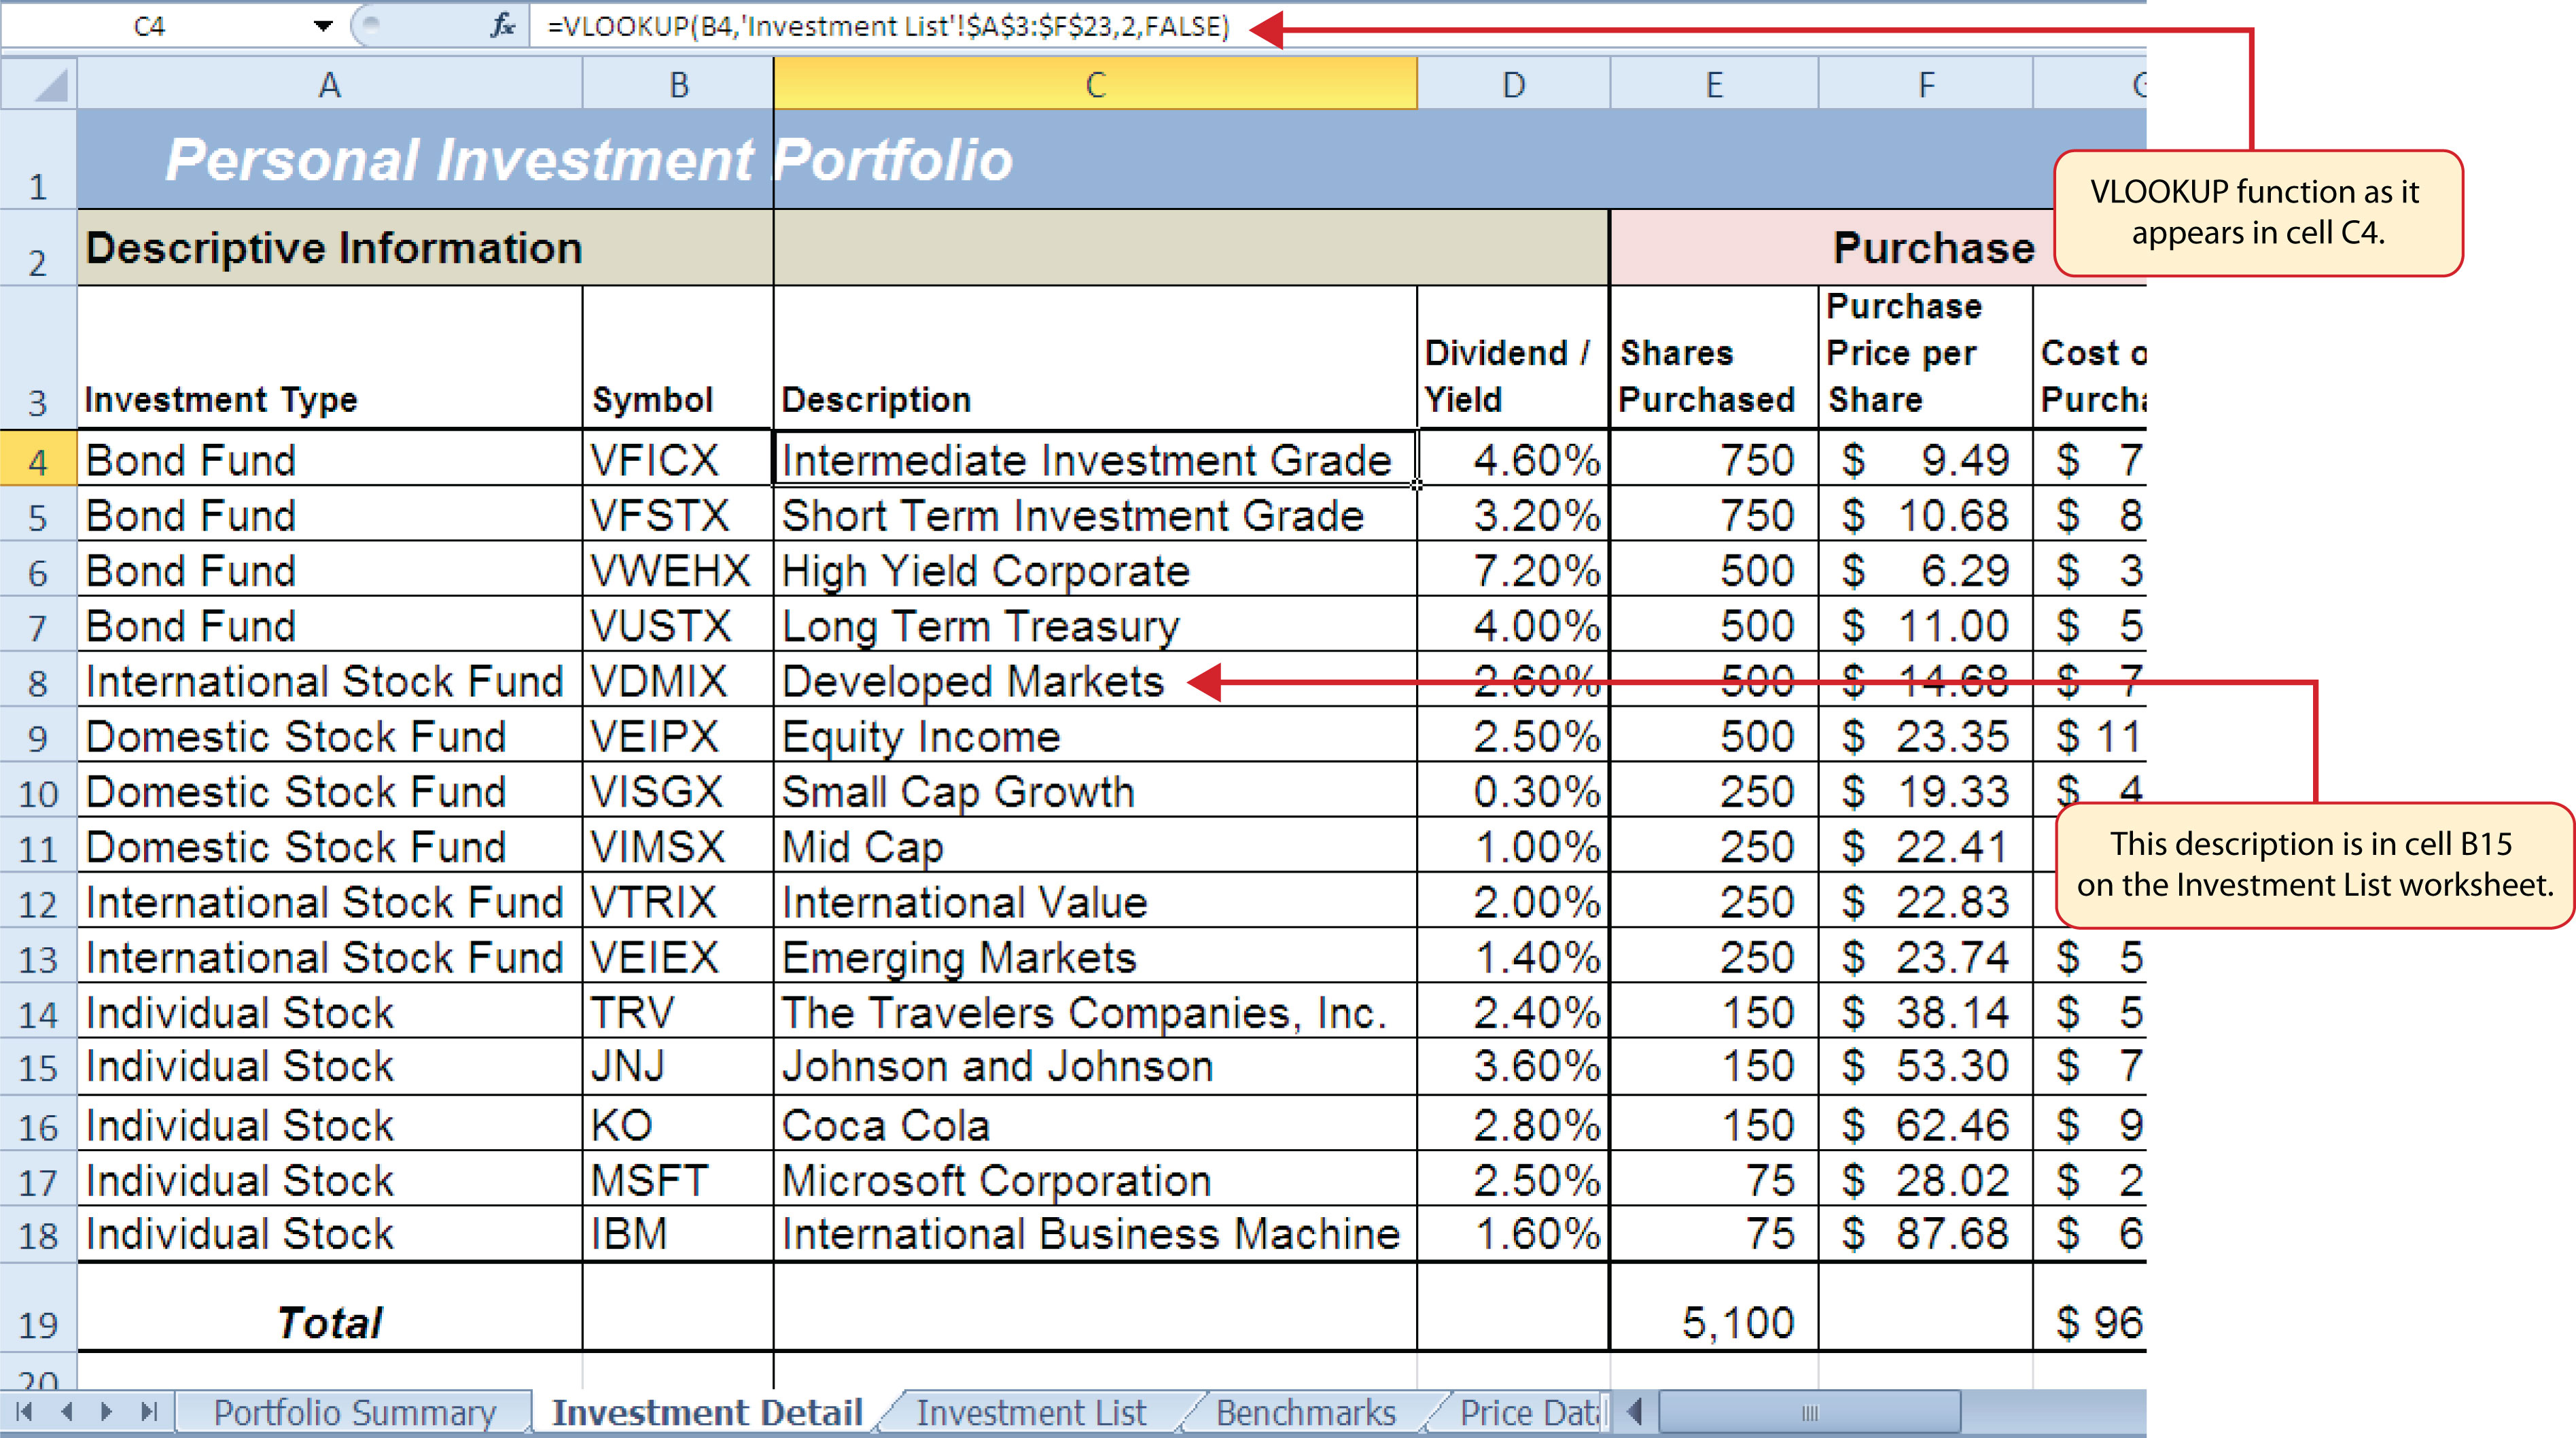 worksheet Excel Worksheet Function lookup functions figure 3 44 results of the vlookup function in investment detail worksheet